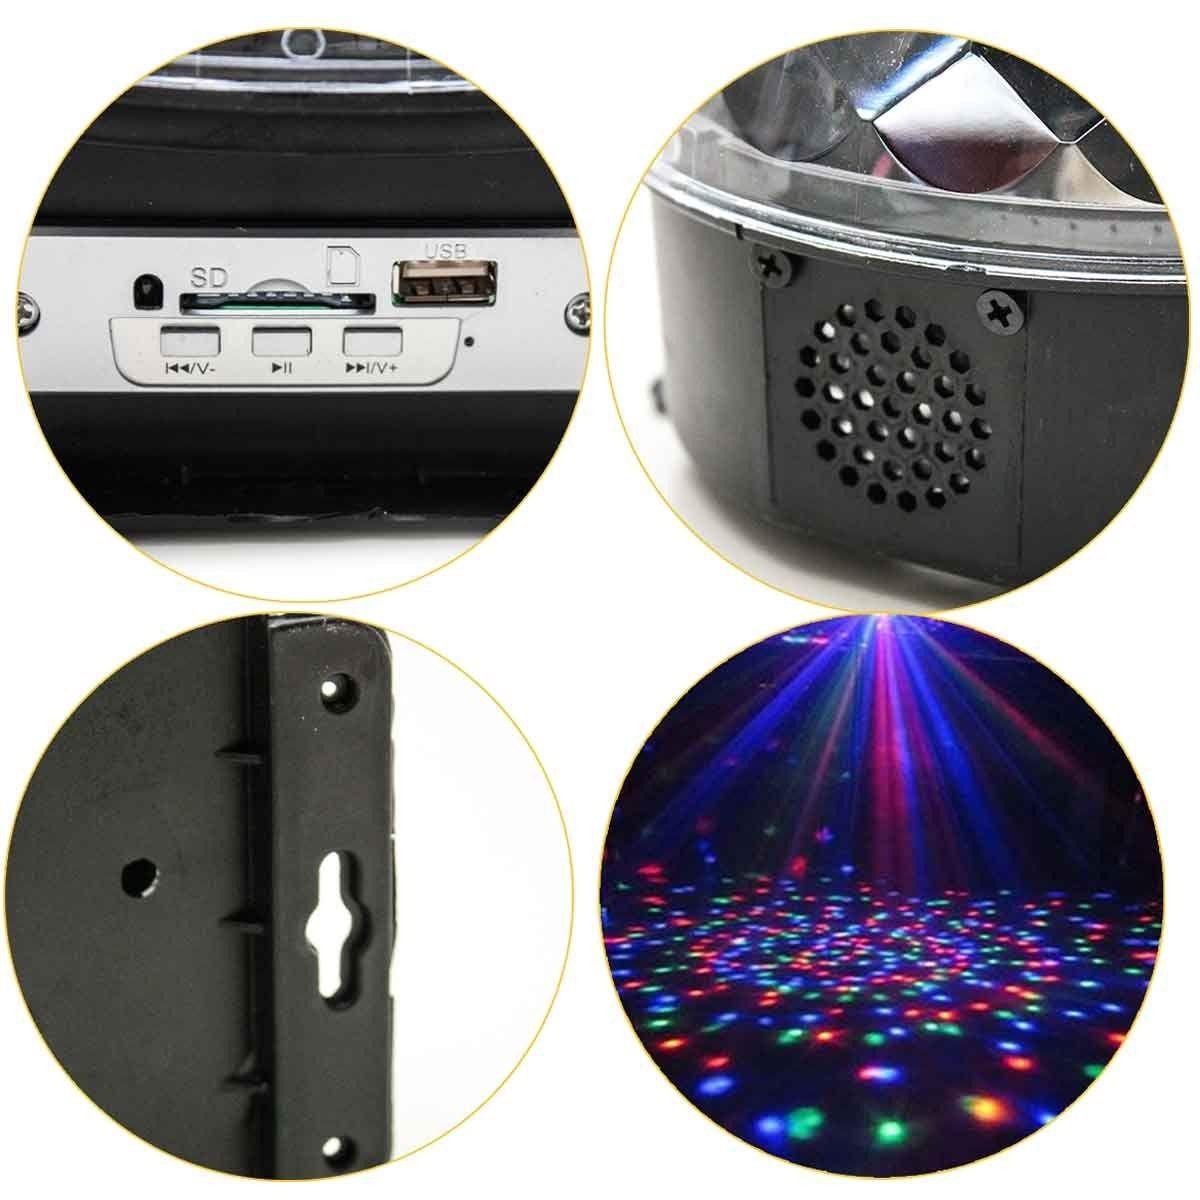 Globo Magico Led De Cristal Luatek 30 WATTS RGB MP3 CONTROLE LK 306B - Usb/sd